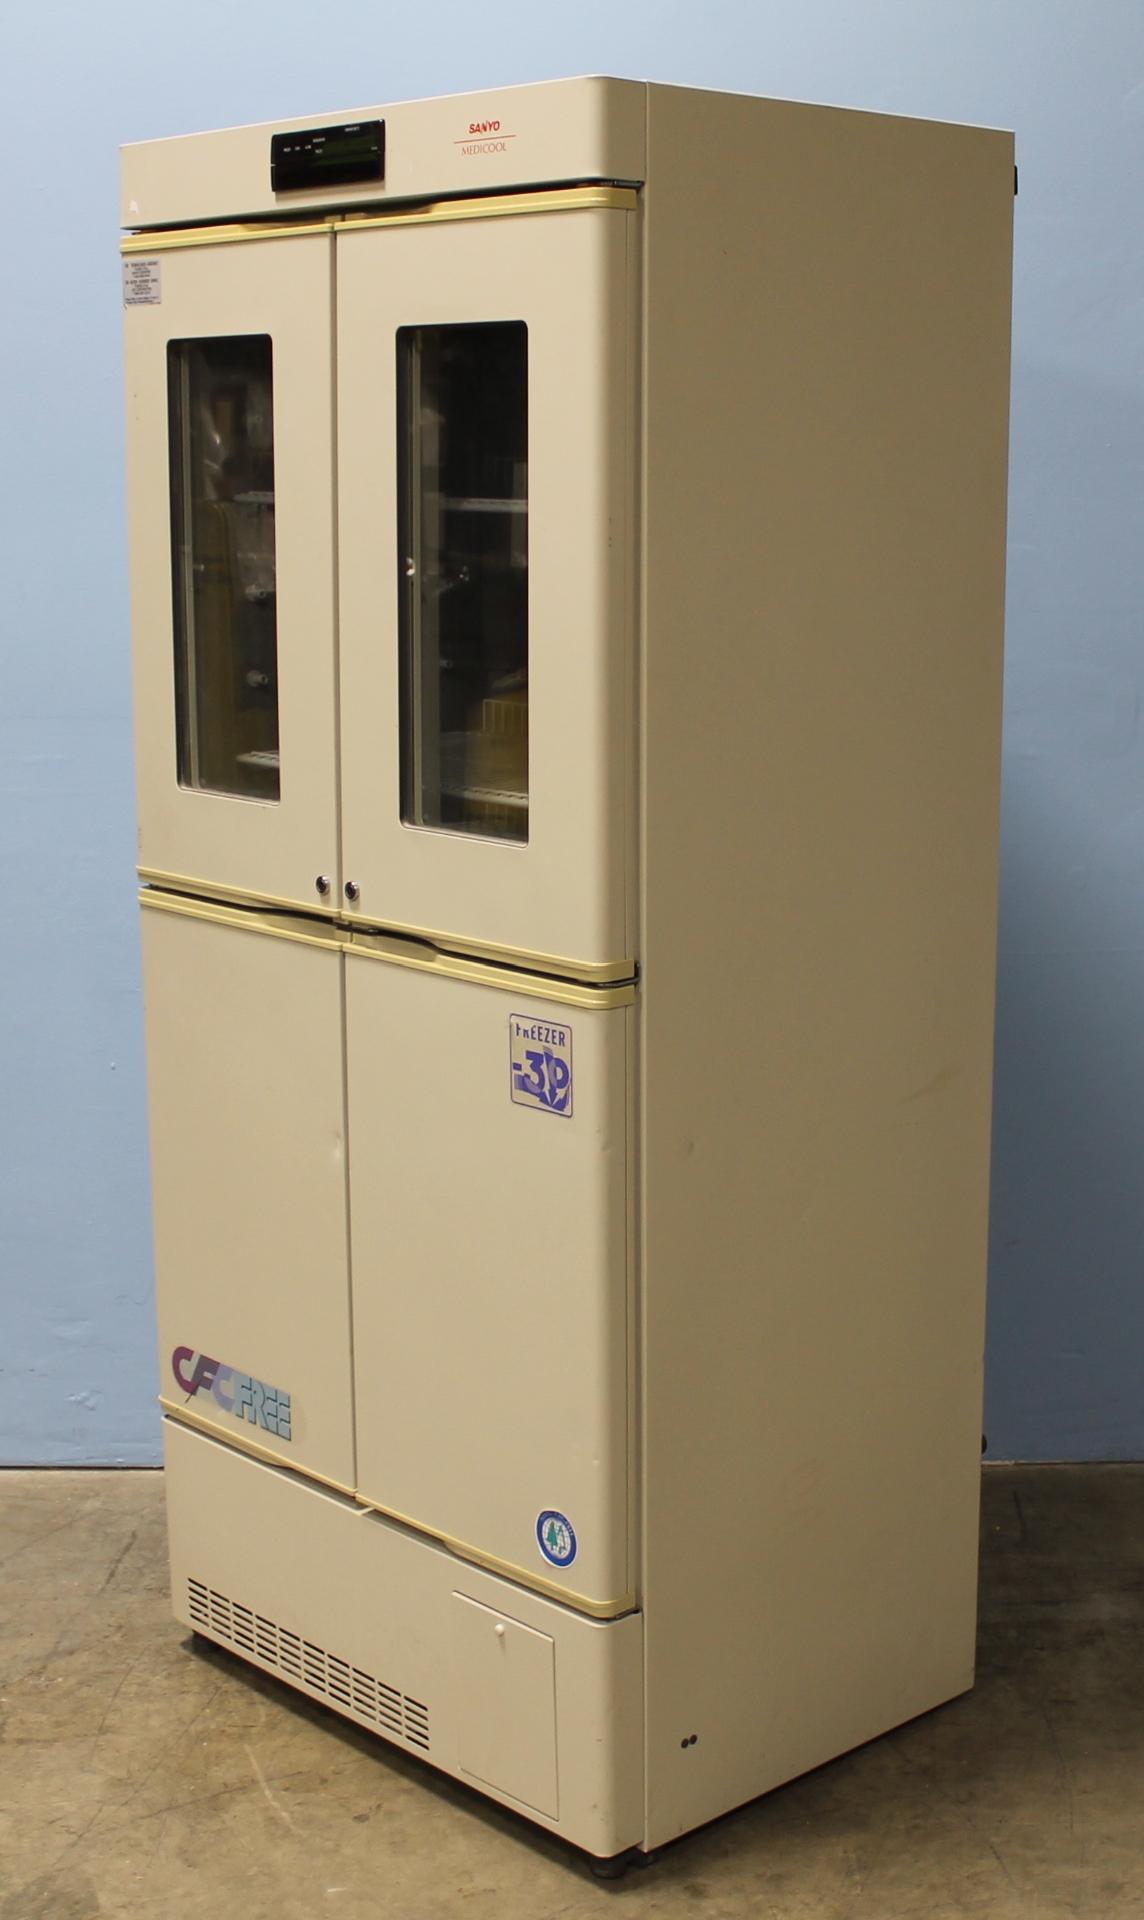 Refurbished Sanyo Mpr 411f Pharmaceutical Refrigerator